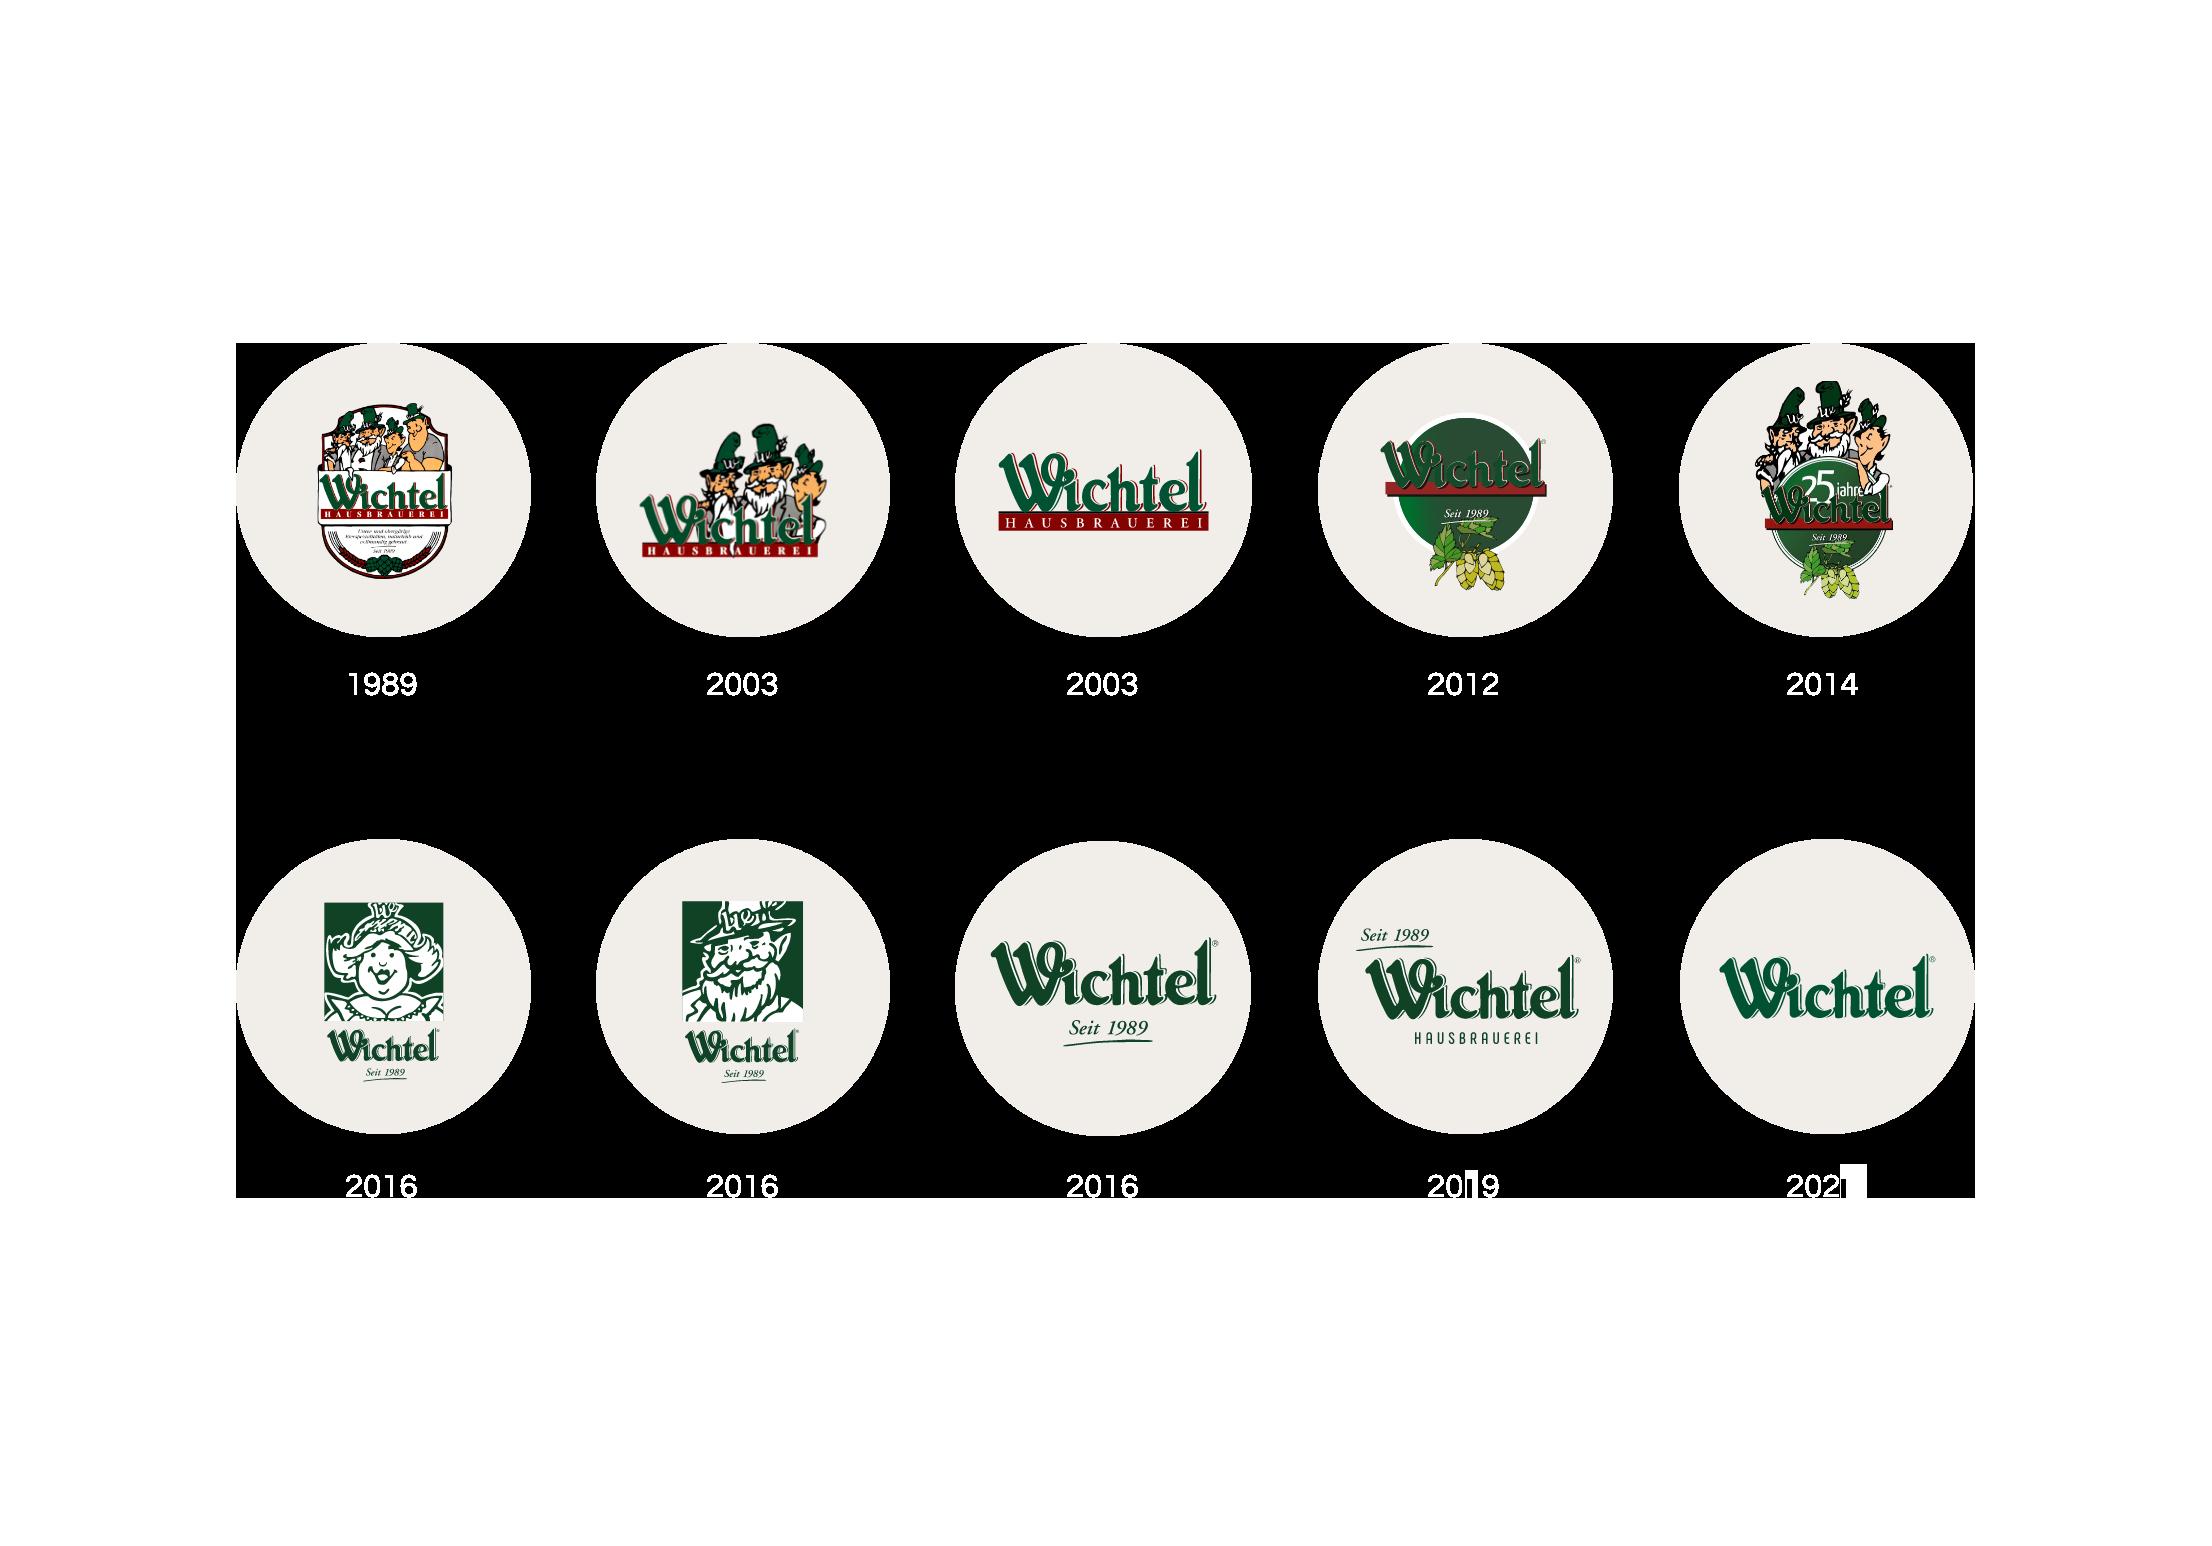 https://www.wichtel.de/wp-content/uploads/2021/04/Logos.png